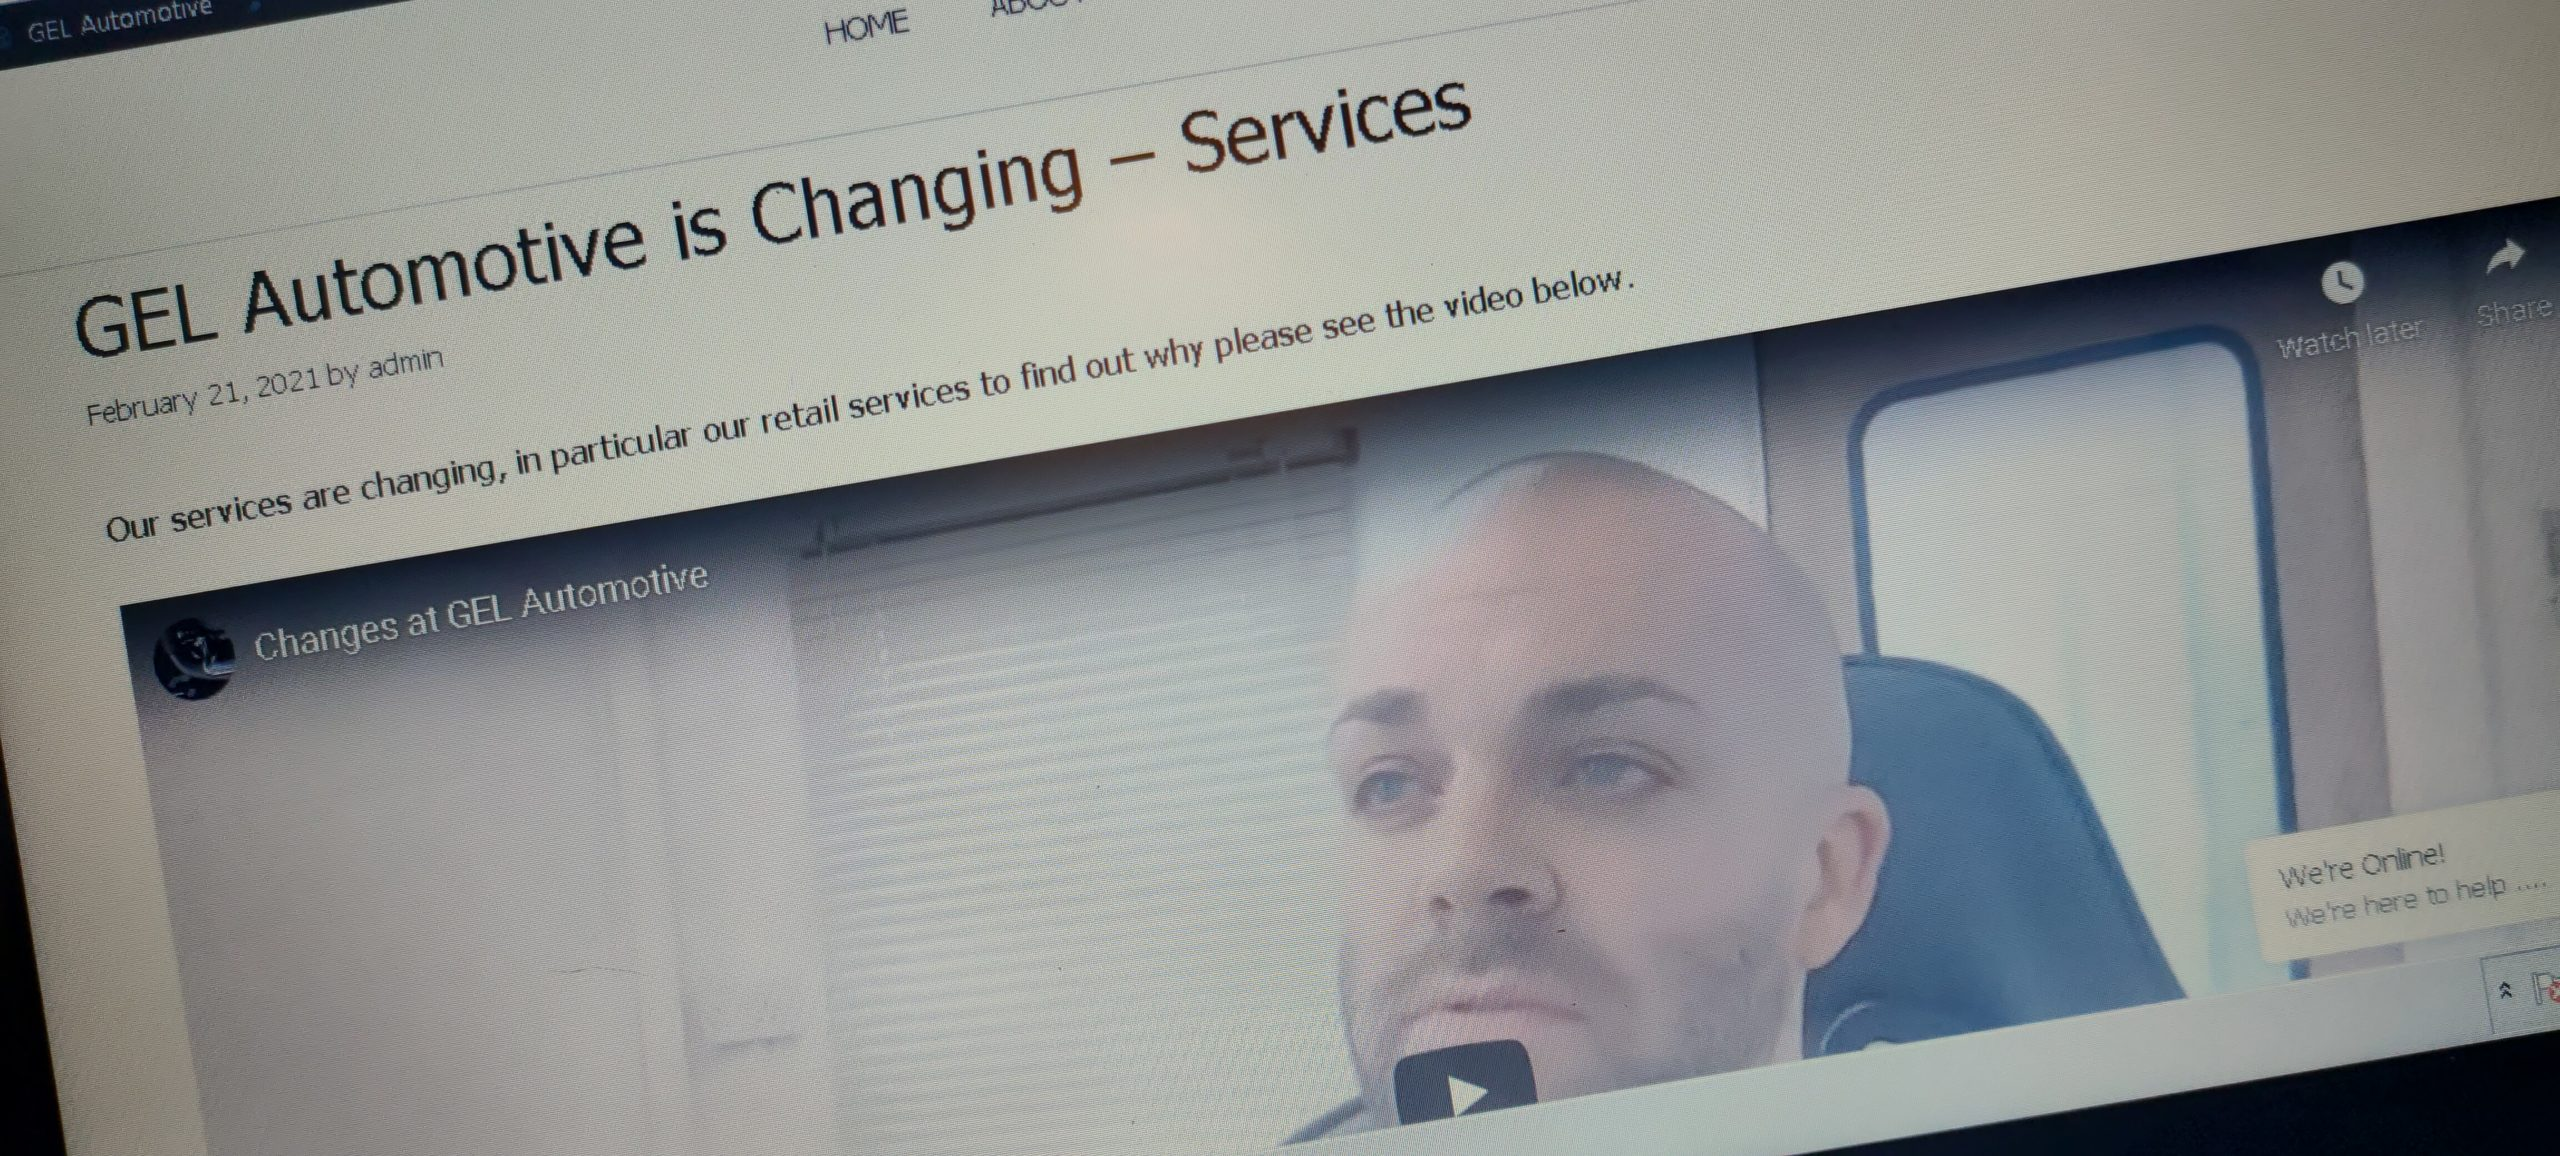 gel automotive changing services